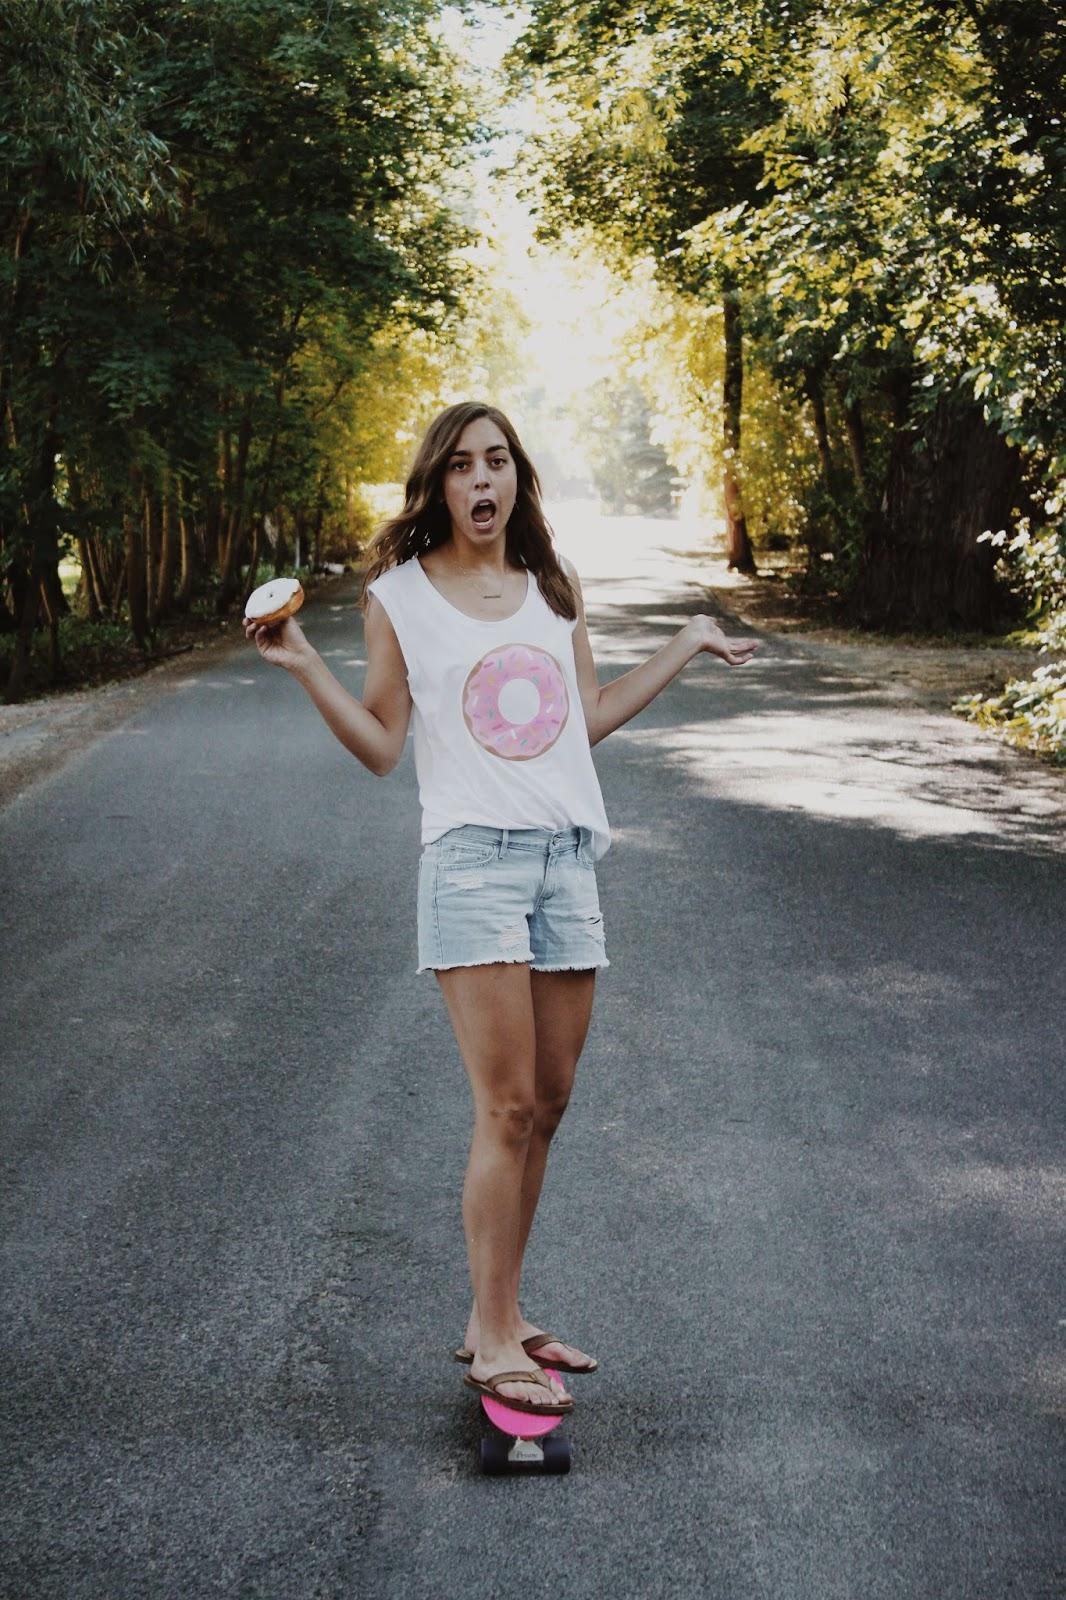 Donut T-shirt, Donut, Girl, Skateboard, Donut Day, Doughnut,